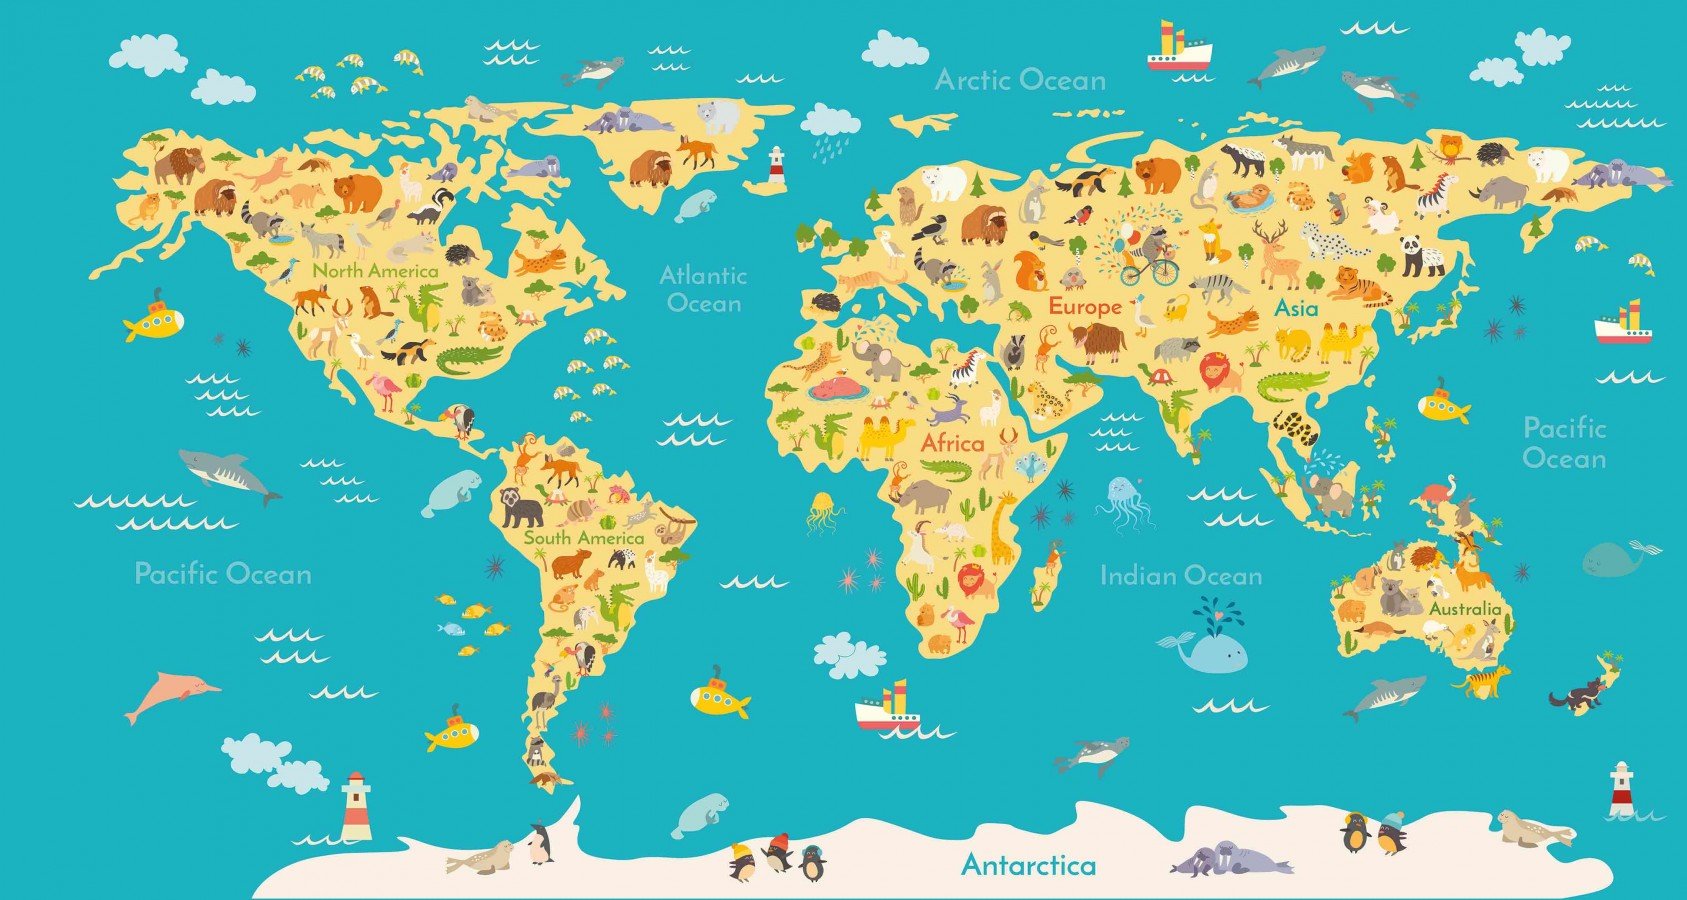 Fotomural Animals World Map A08-M938   A08-M938